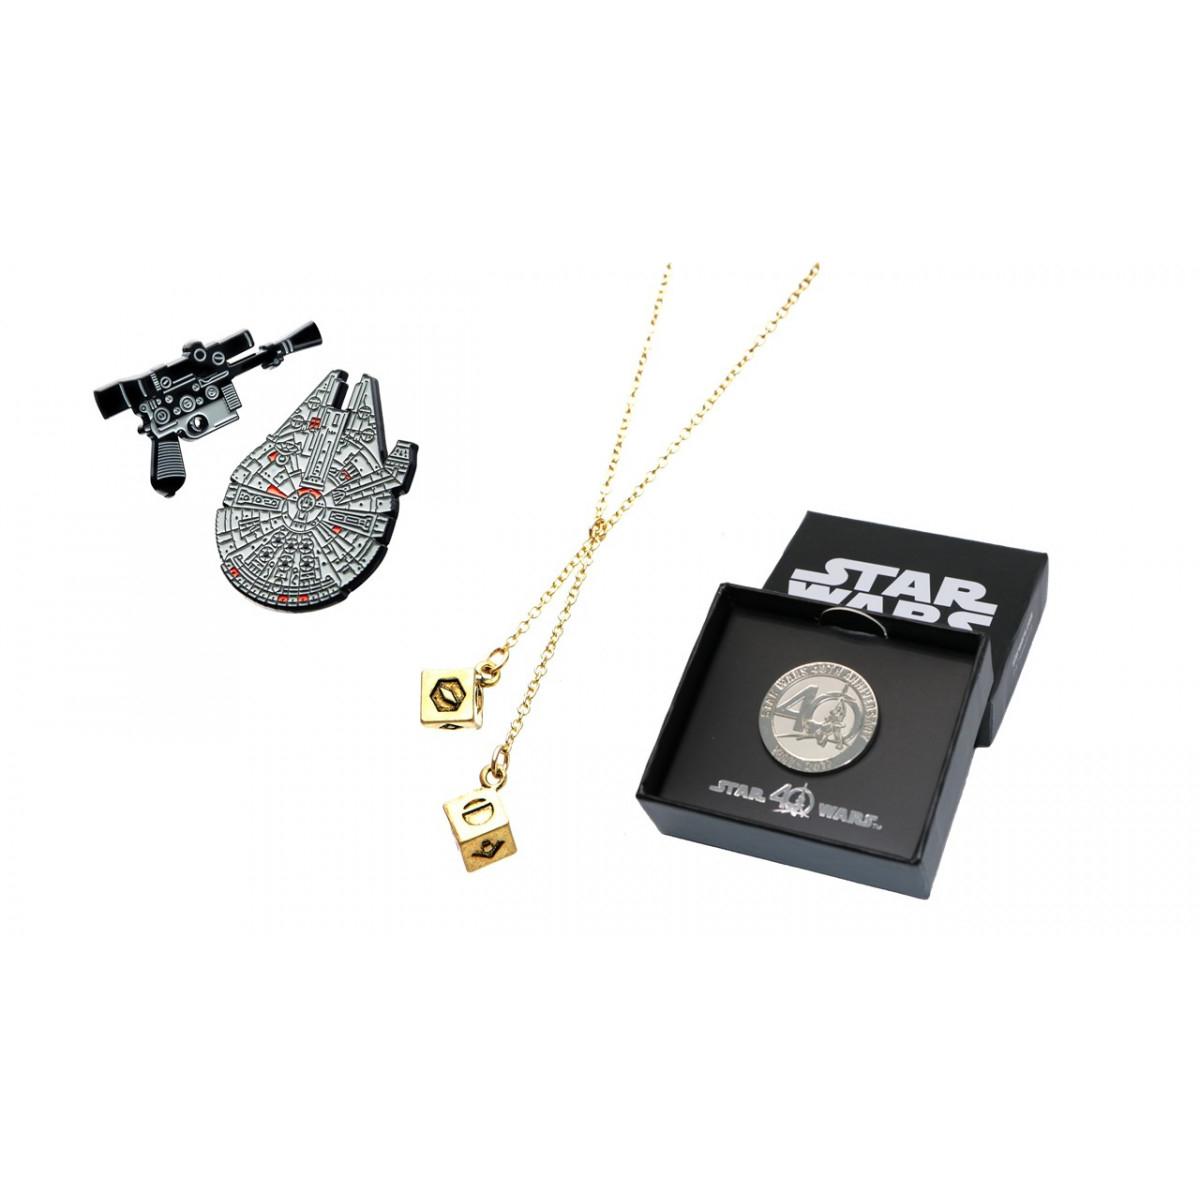 Pack de goodies Han Solo Star Wars IV - 40 ans (tesheros.com)